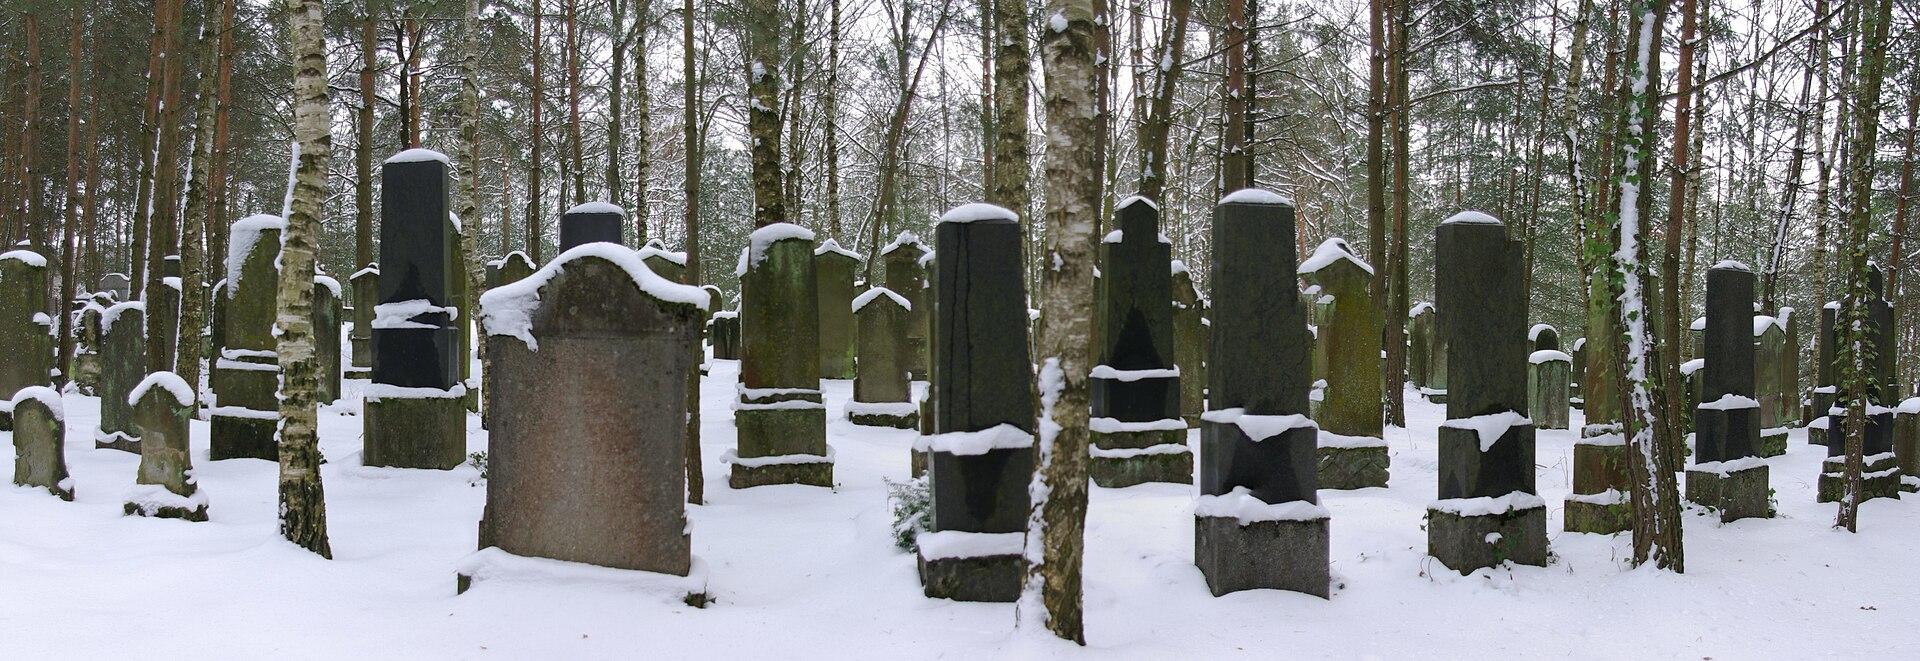 Hemhofen Zeckern Jüdischer Friedhof 003.JPG